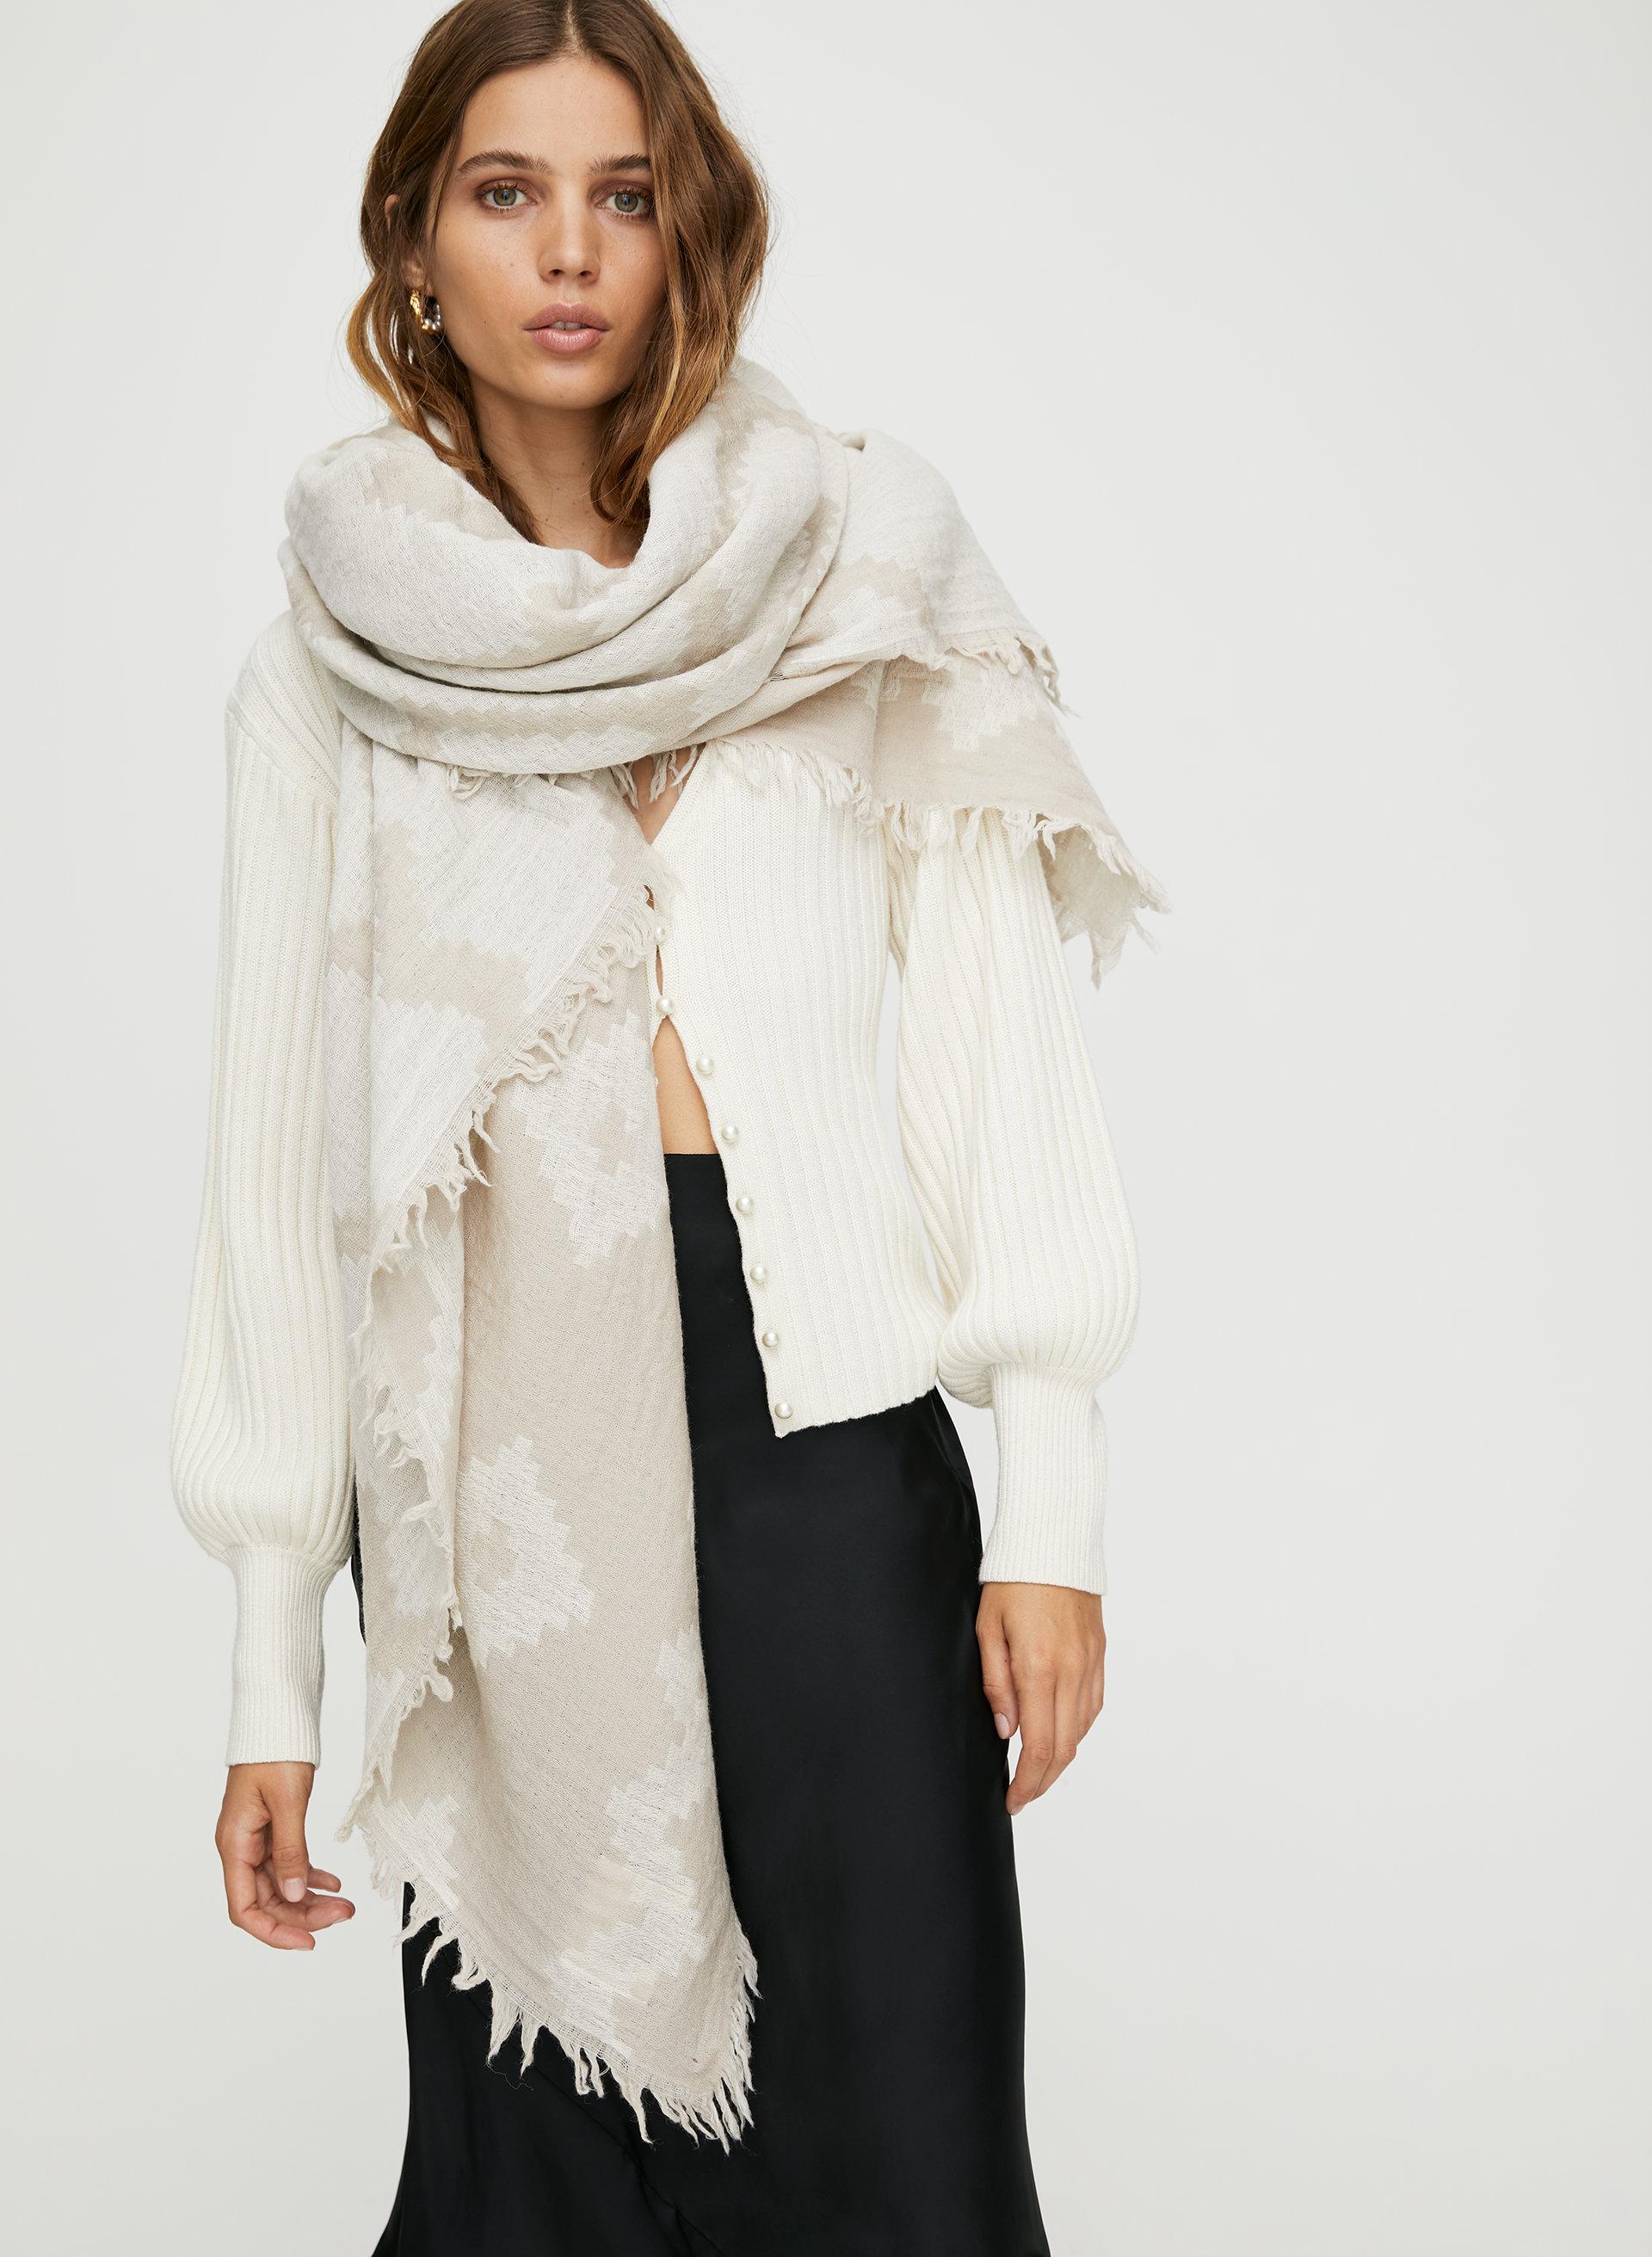 47755befb1c7d diamond mosaic blanket scarf Patterned, wool blanket scarf